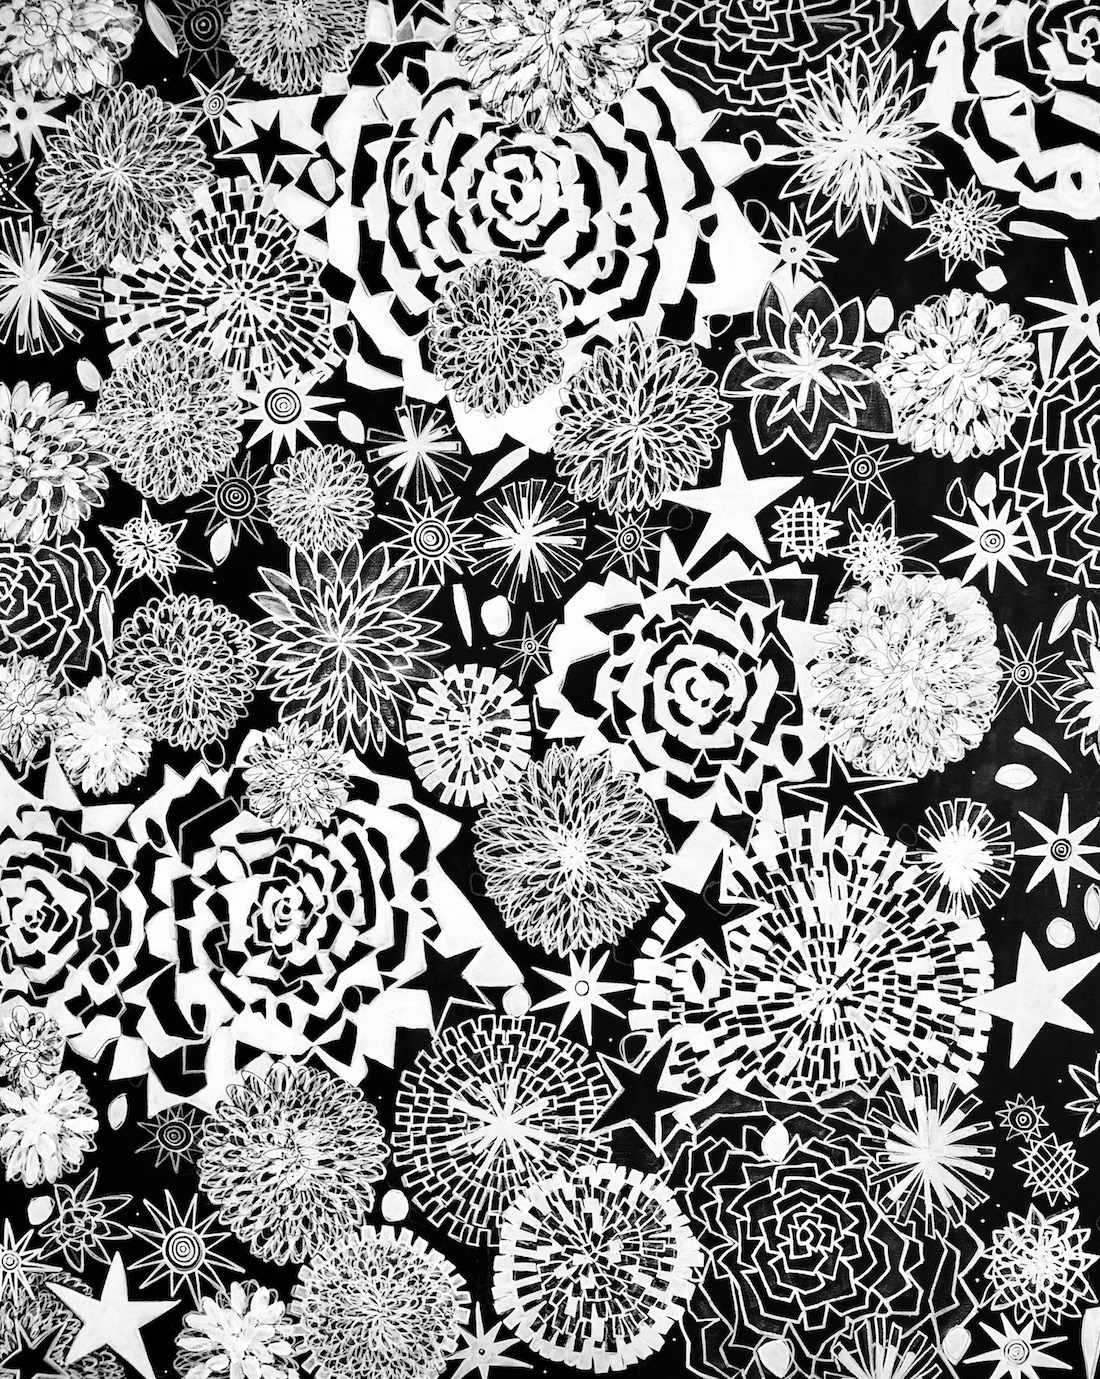 cosmic GARDENS SUSANNA LADDA GALERIE STARNBERGER SEE ART